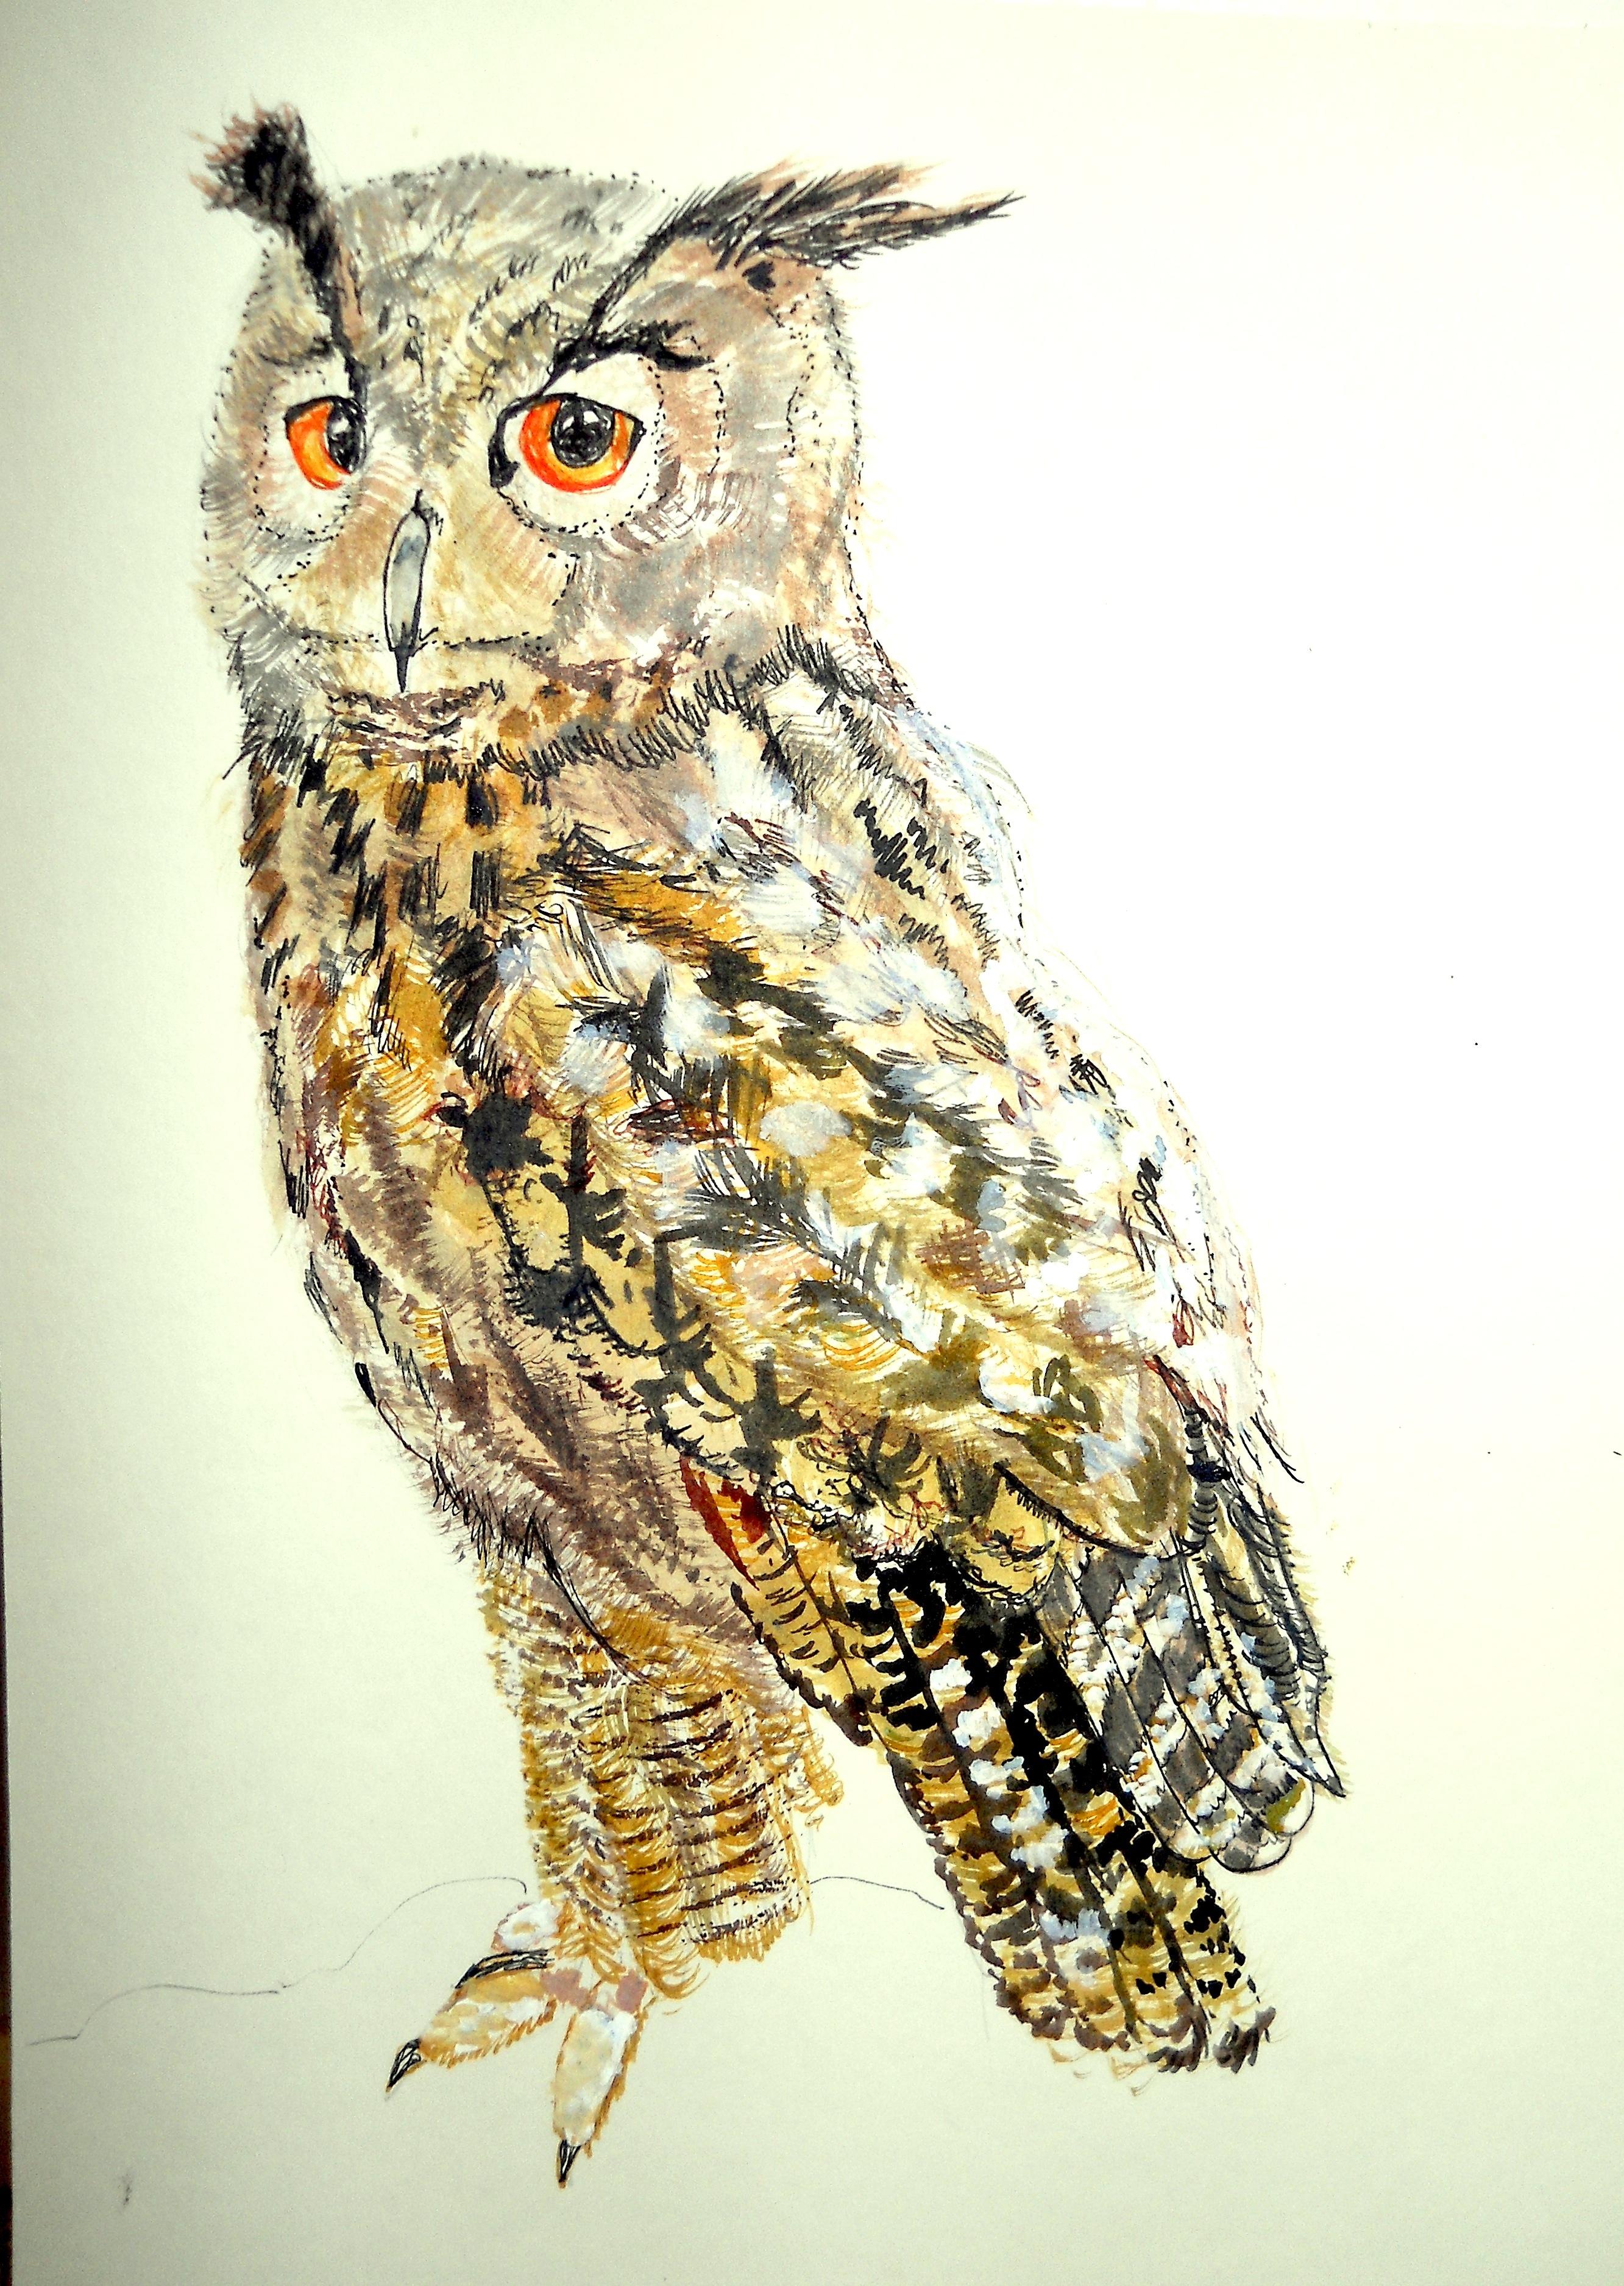 Turkmenian Eagle Owl (Bubo bubo)